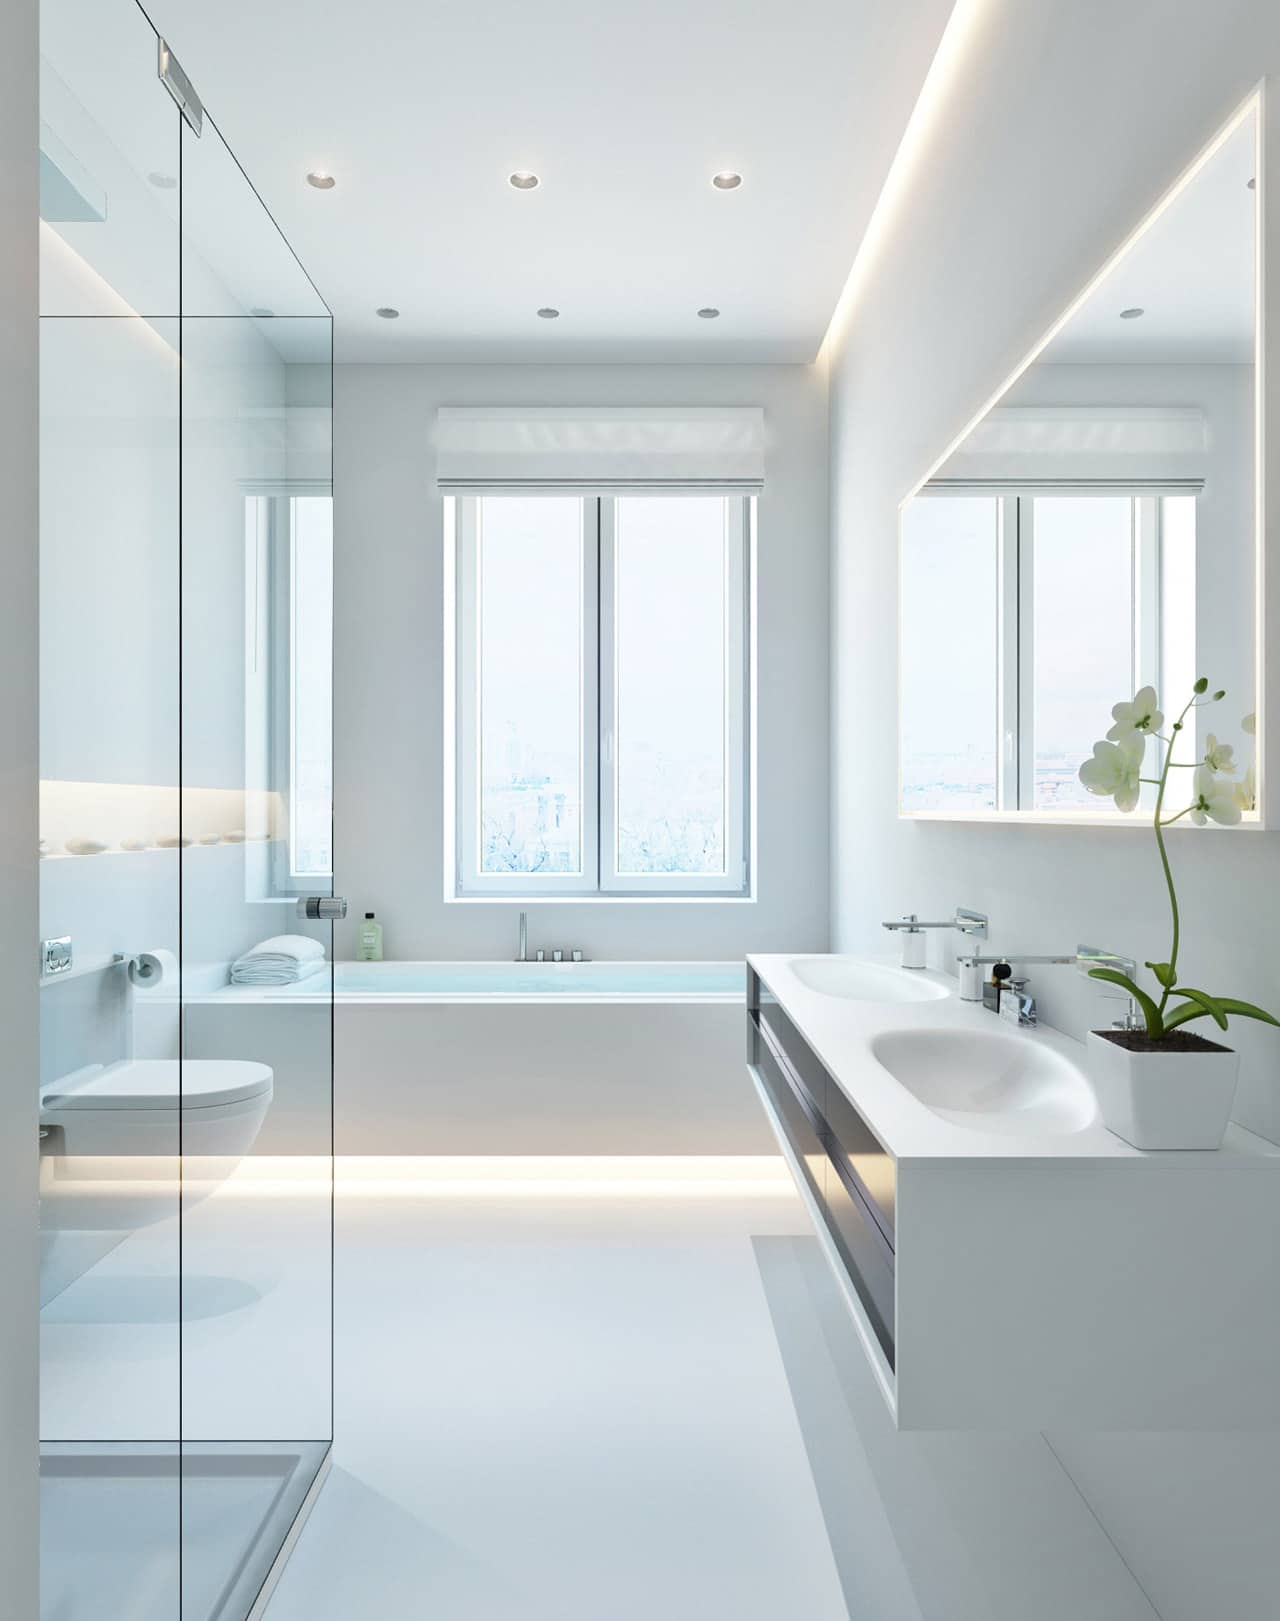 Diseño Dormitorios Baños Modernos   Ante BaÑo BaÑos Baños Modernos ...